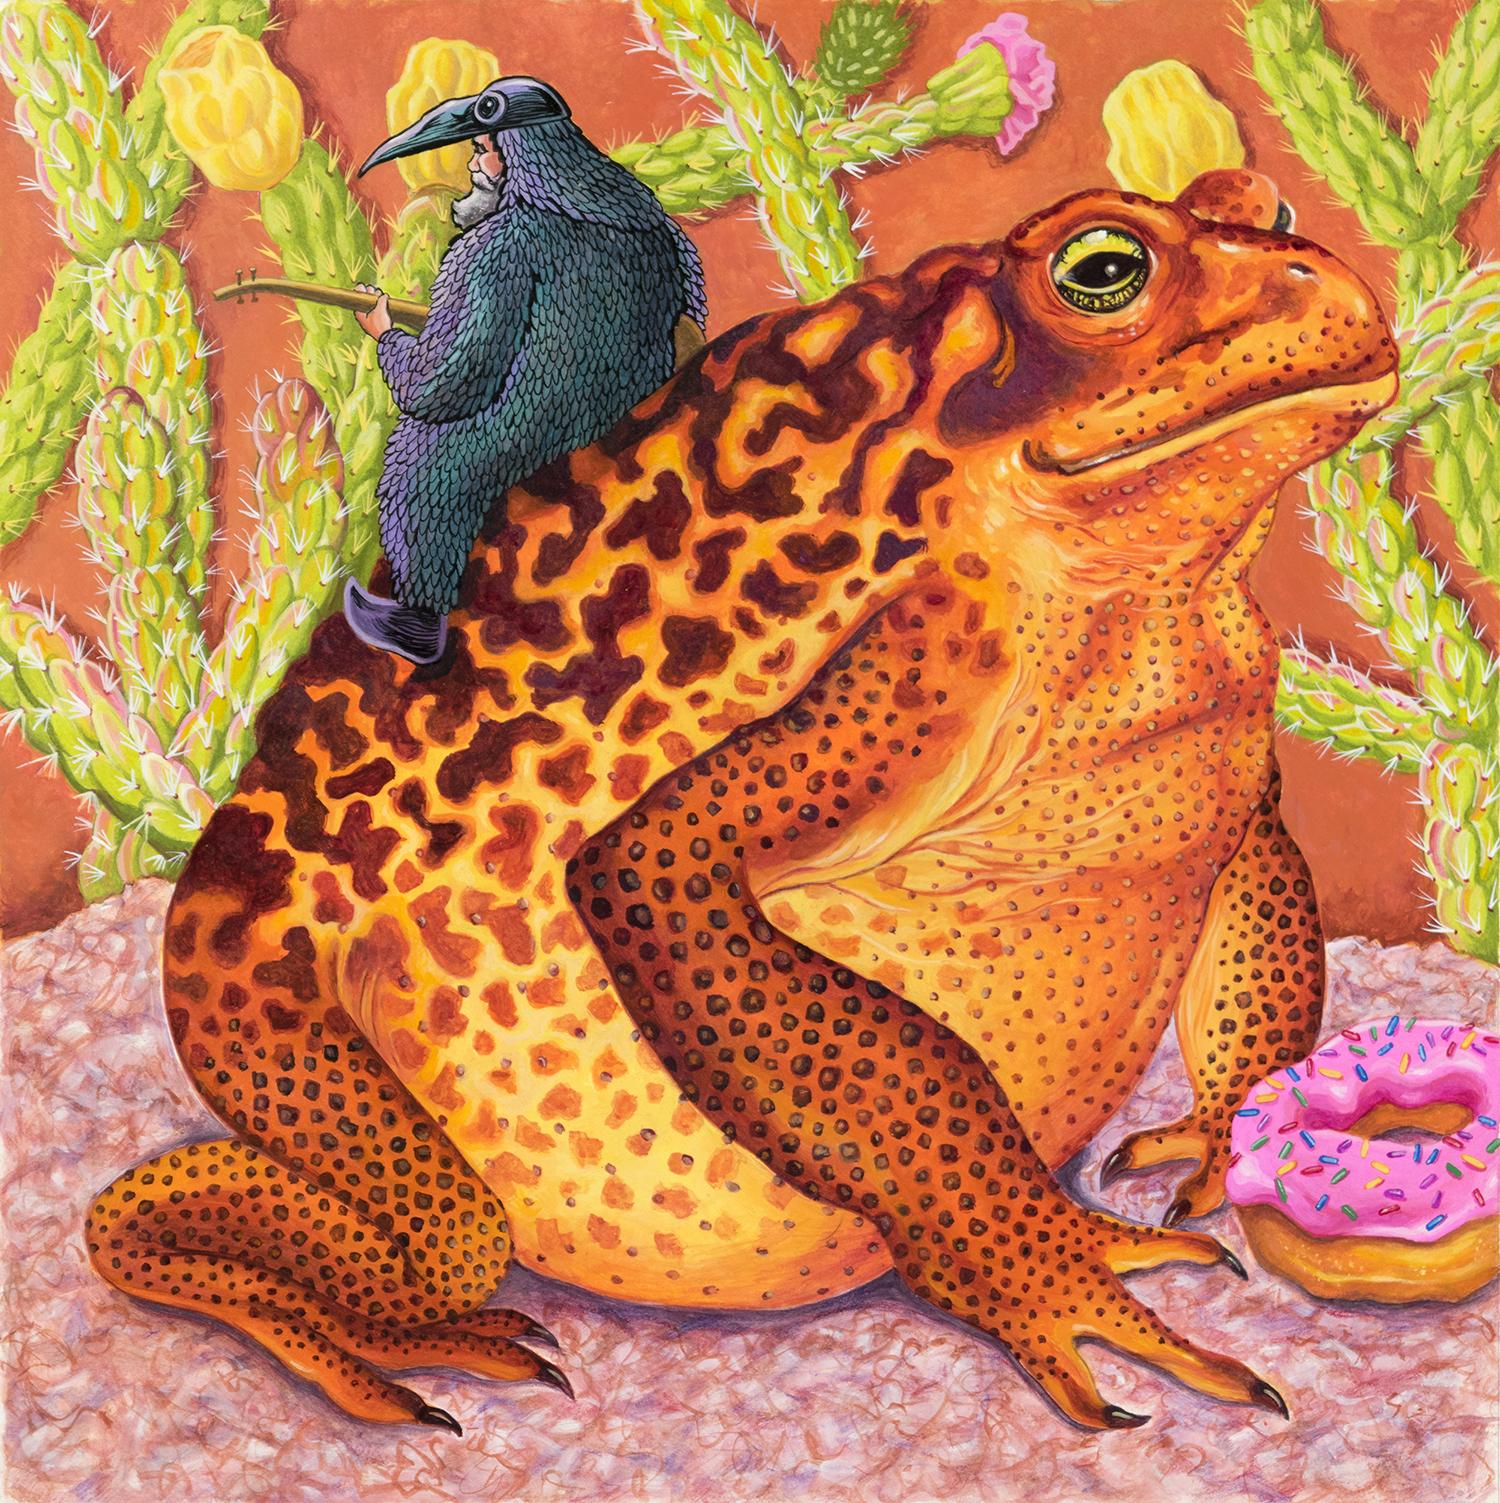 image_toad_donut_cacti_reveler_1500.jpg